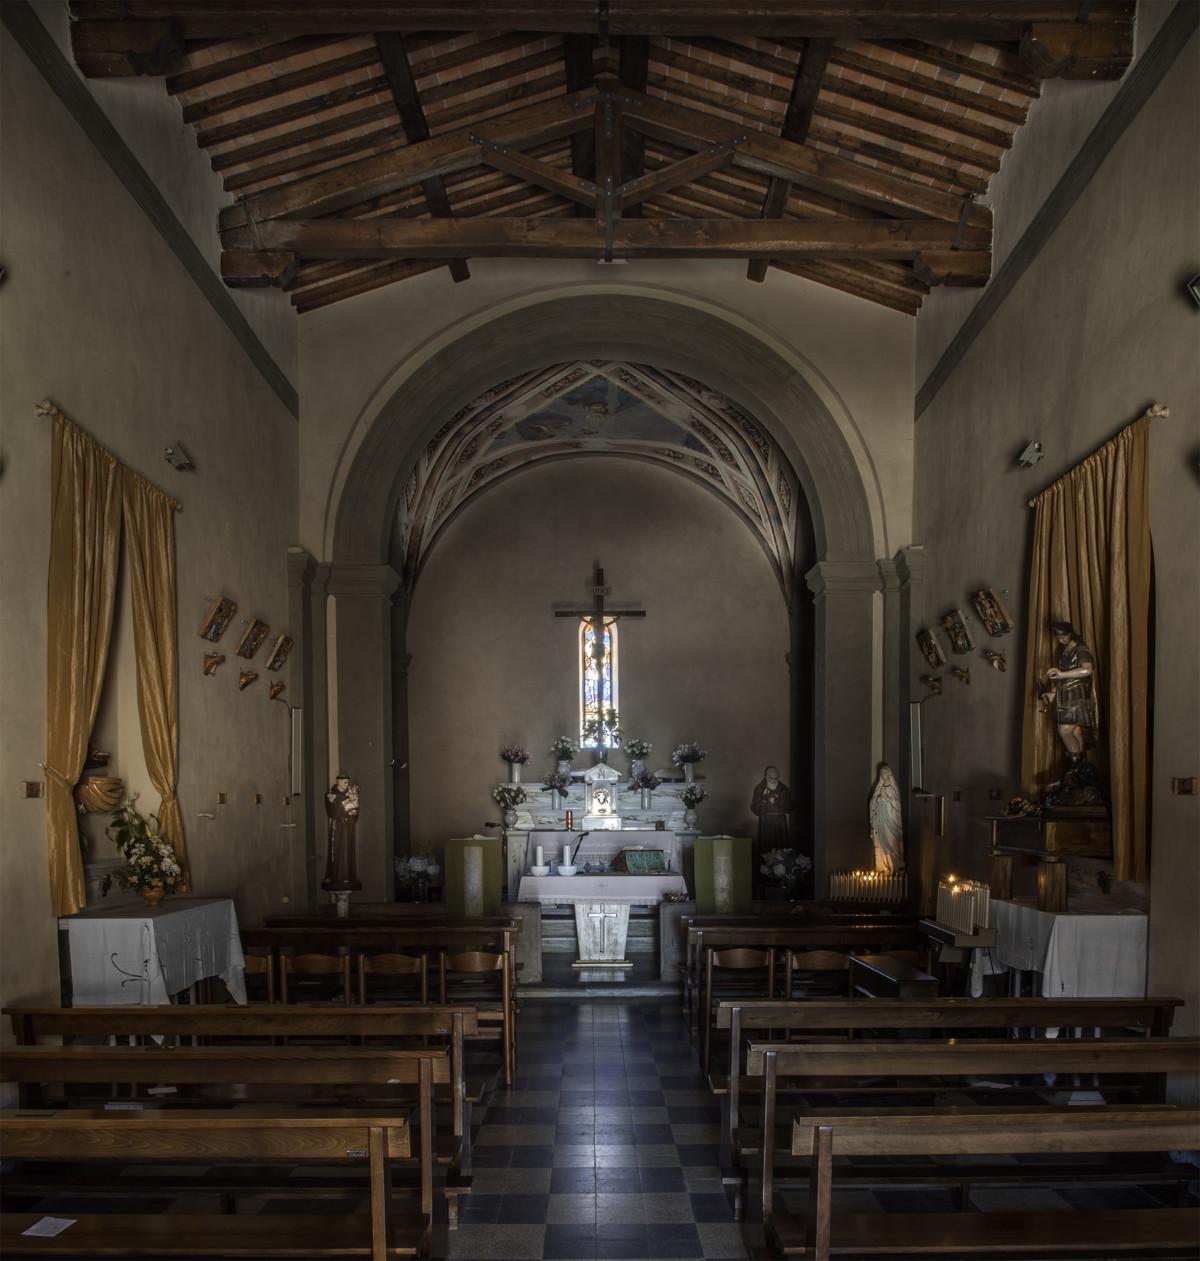 Chiesa San Michele Arcangelo, Avaglio